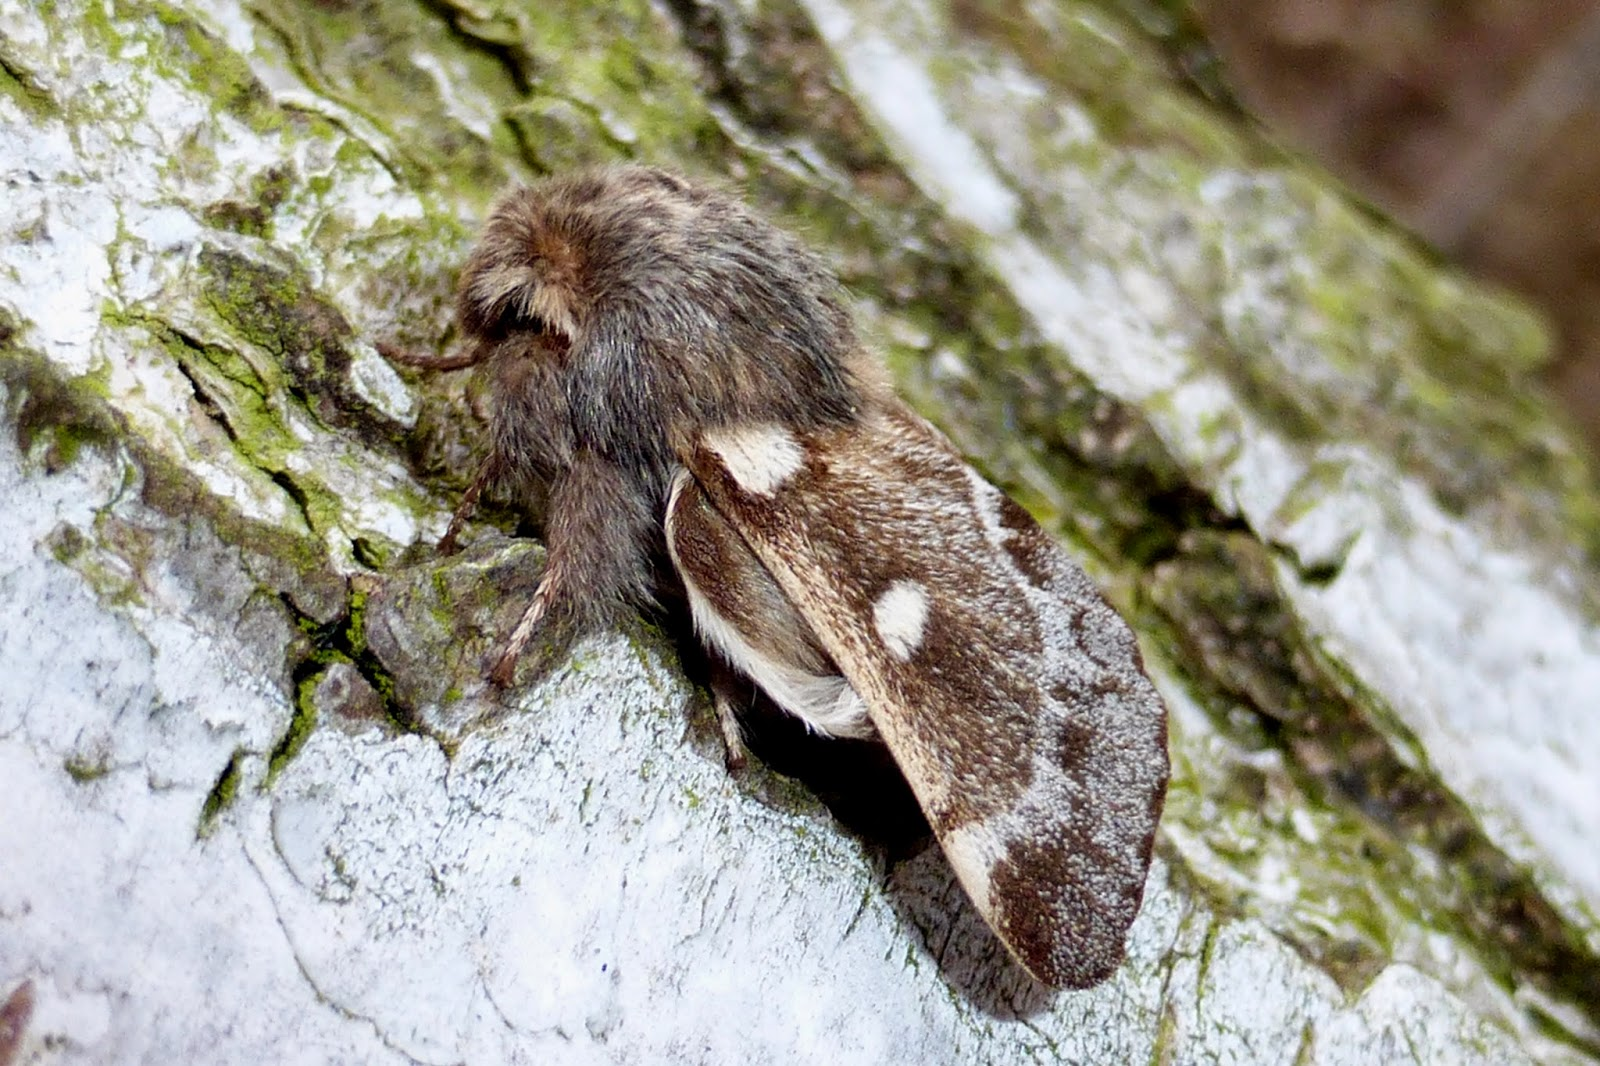 Eriogaster lanestris male